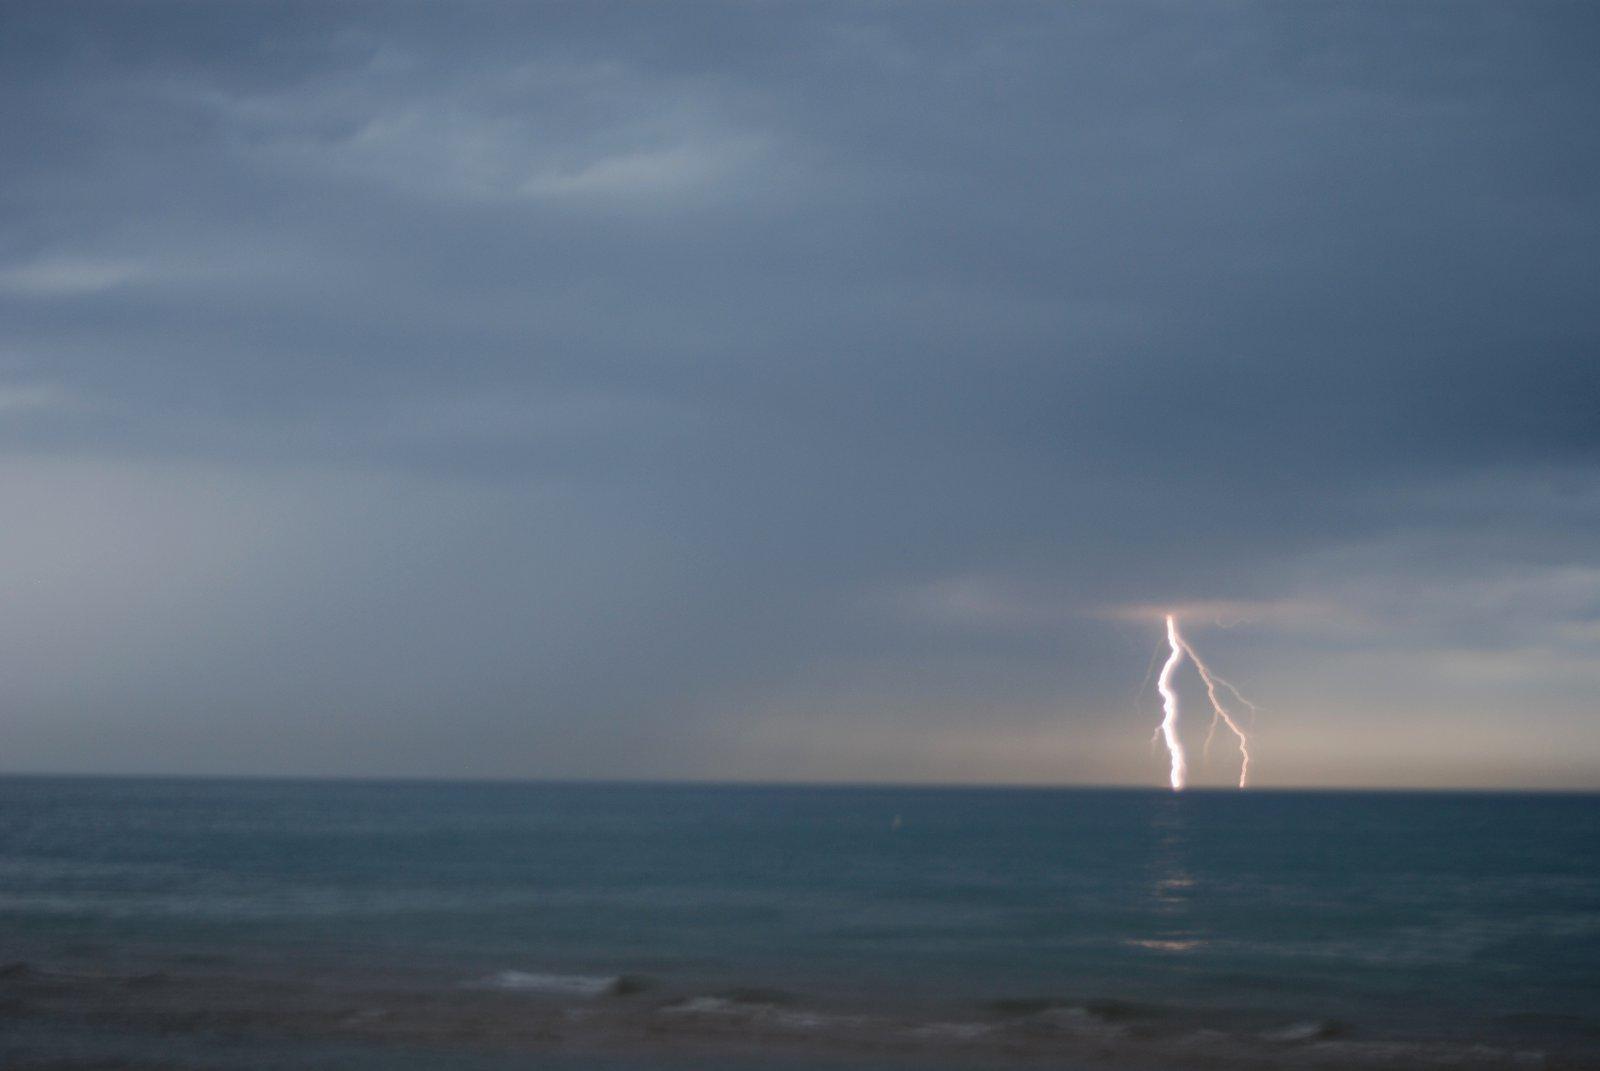 Lightning over lake michigan